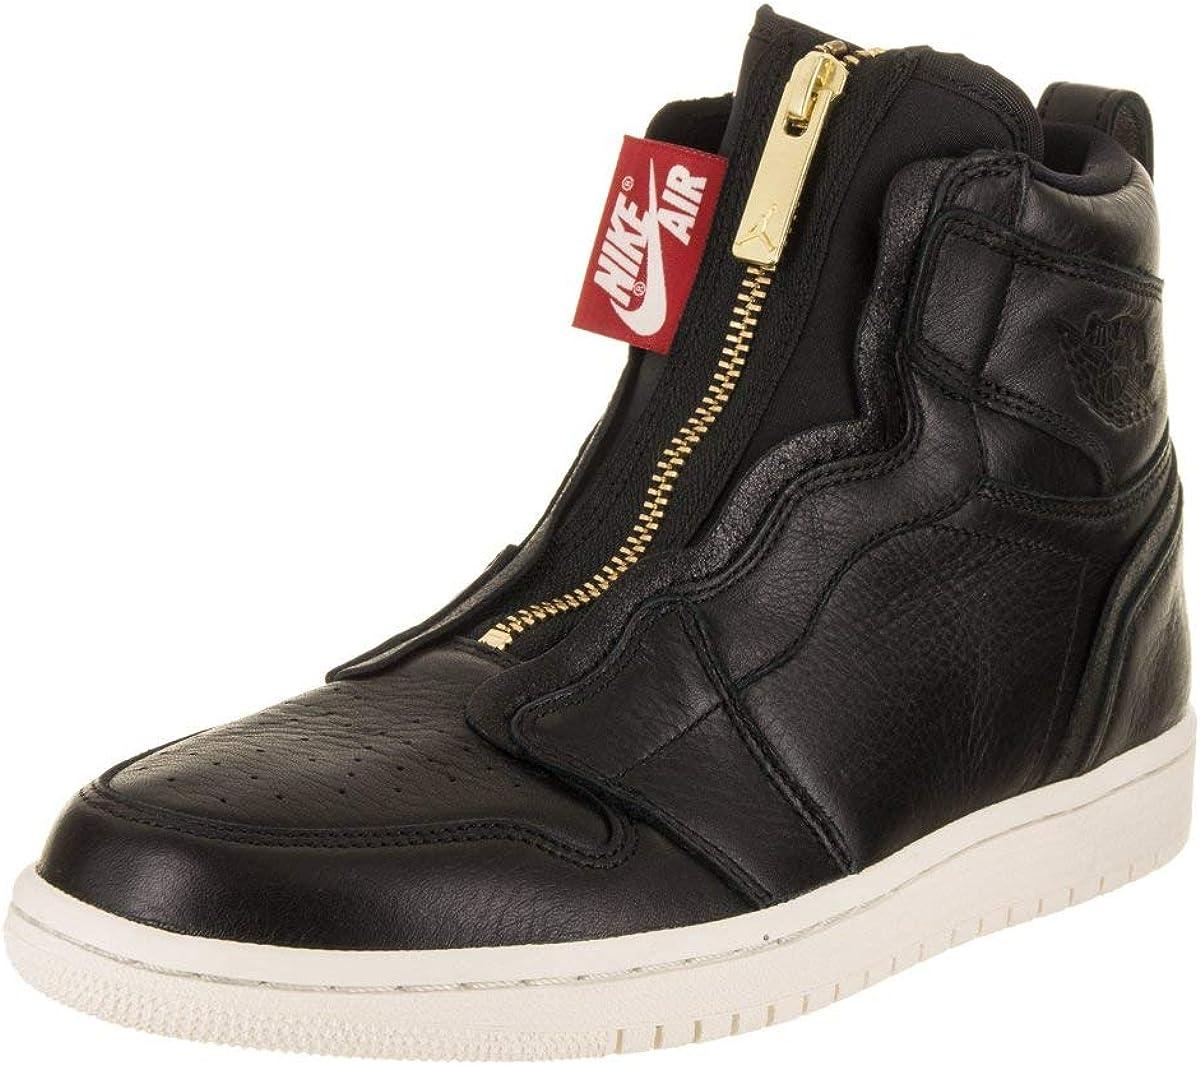 Wmns Air Jordan 1 Retro High Zip 'Black'